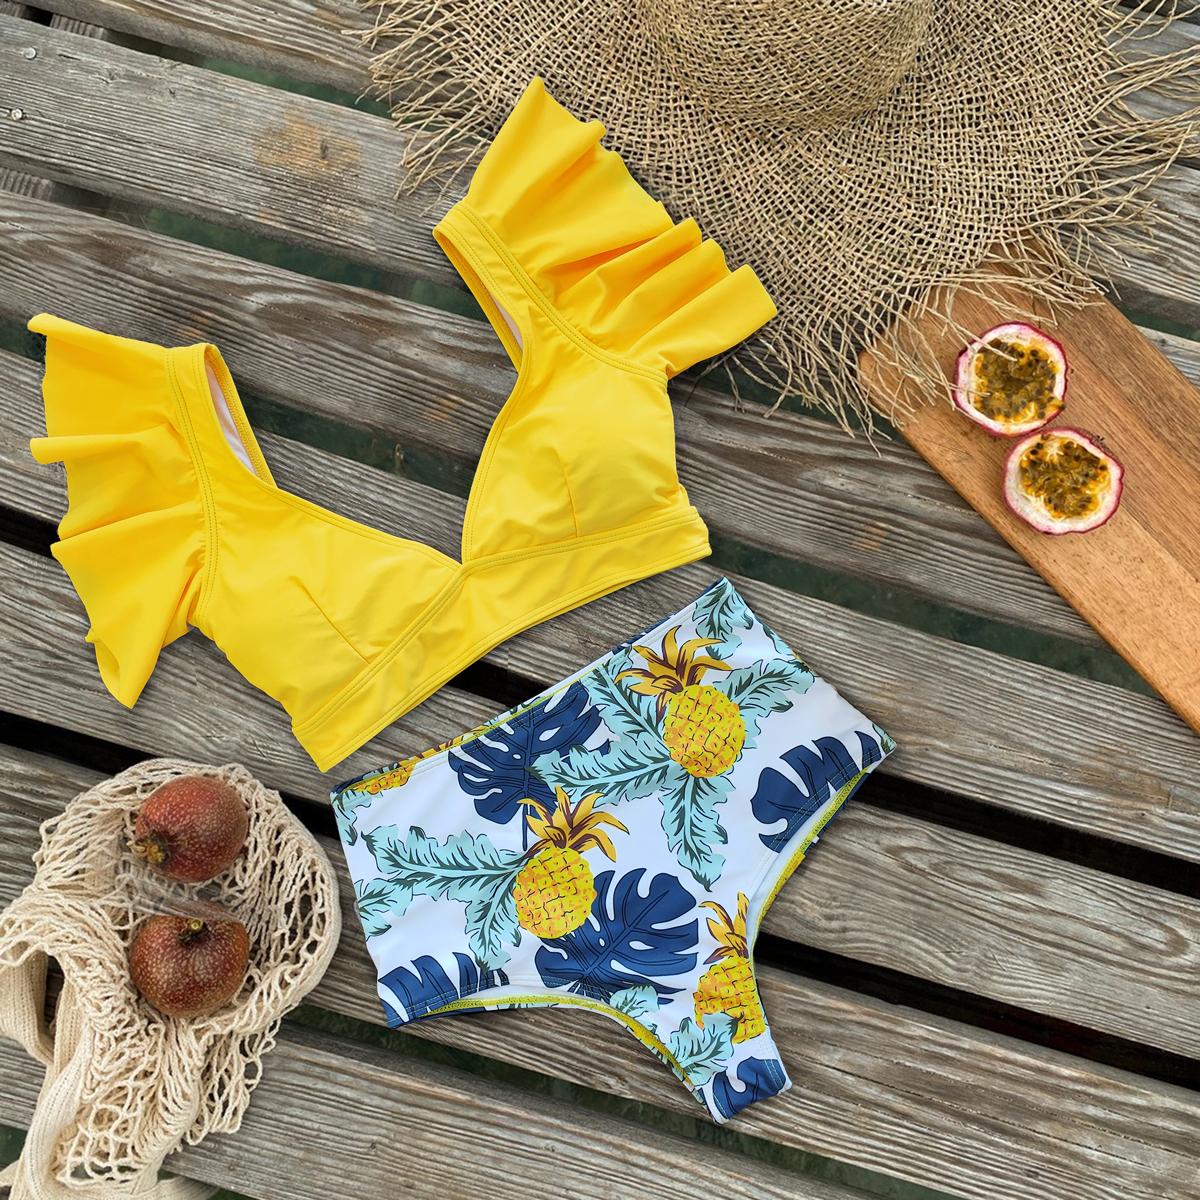 2021 New Swimsuit Women Swimwear High Waist Bikini Ruffle Bikini Set Push Up Bathing Suit Print Beach wear Summer Biquini Female